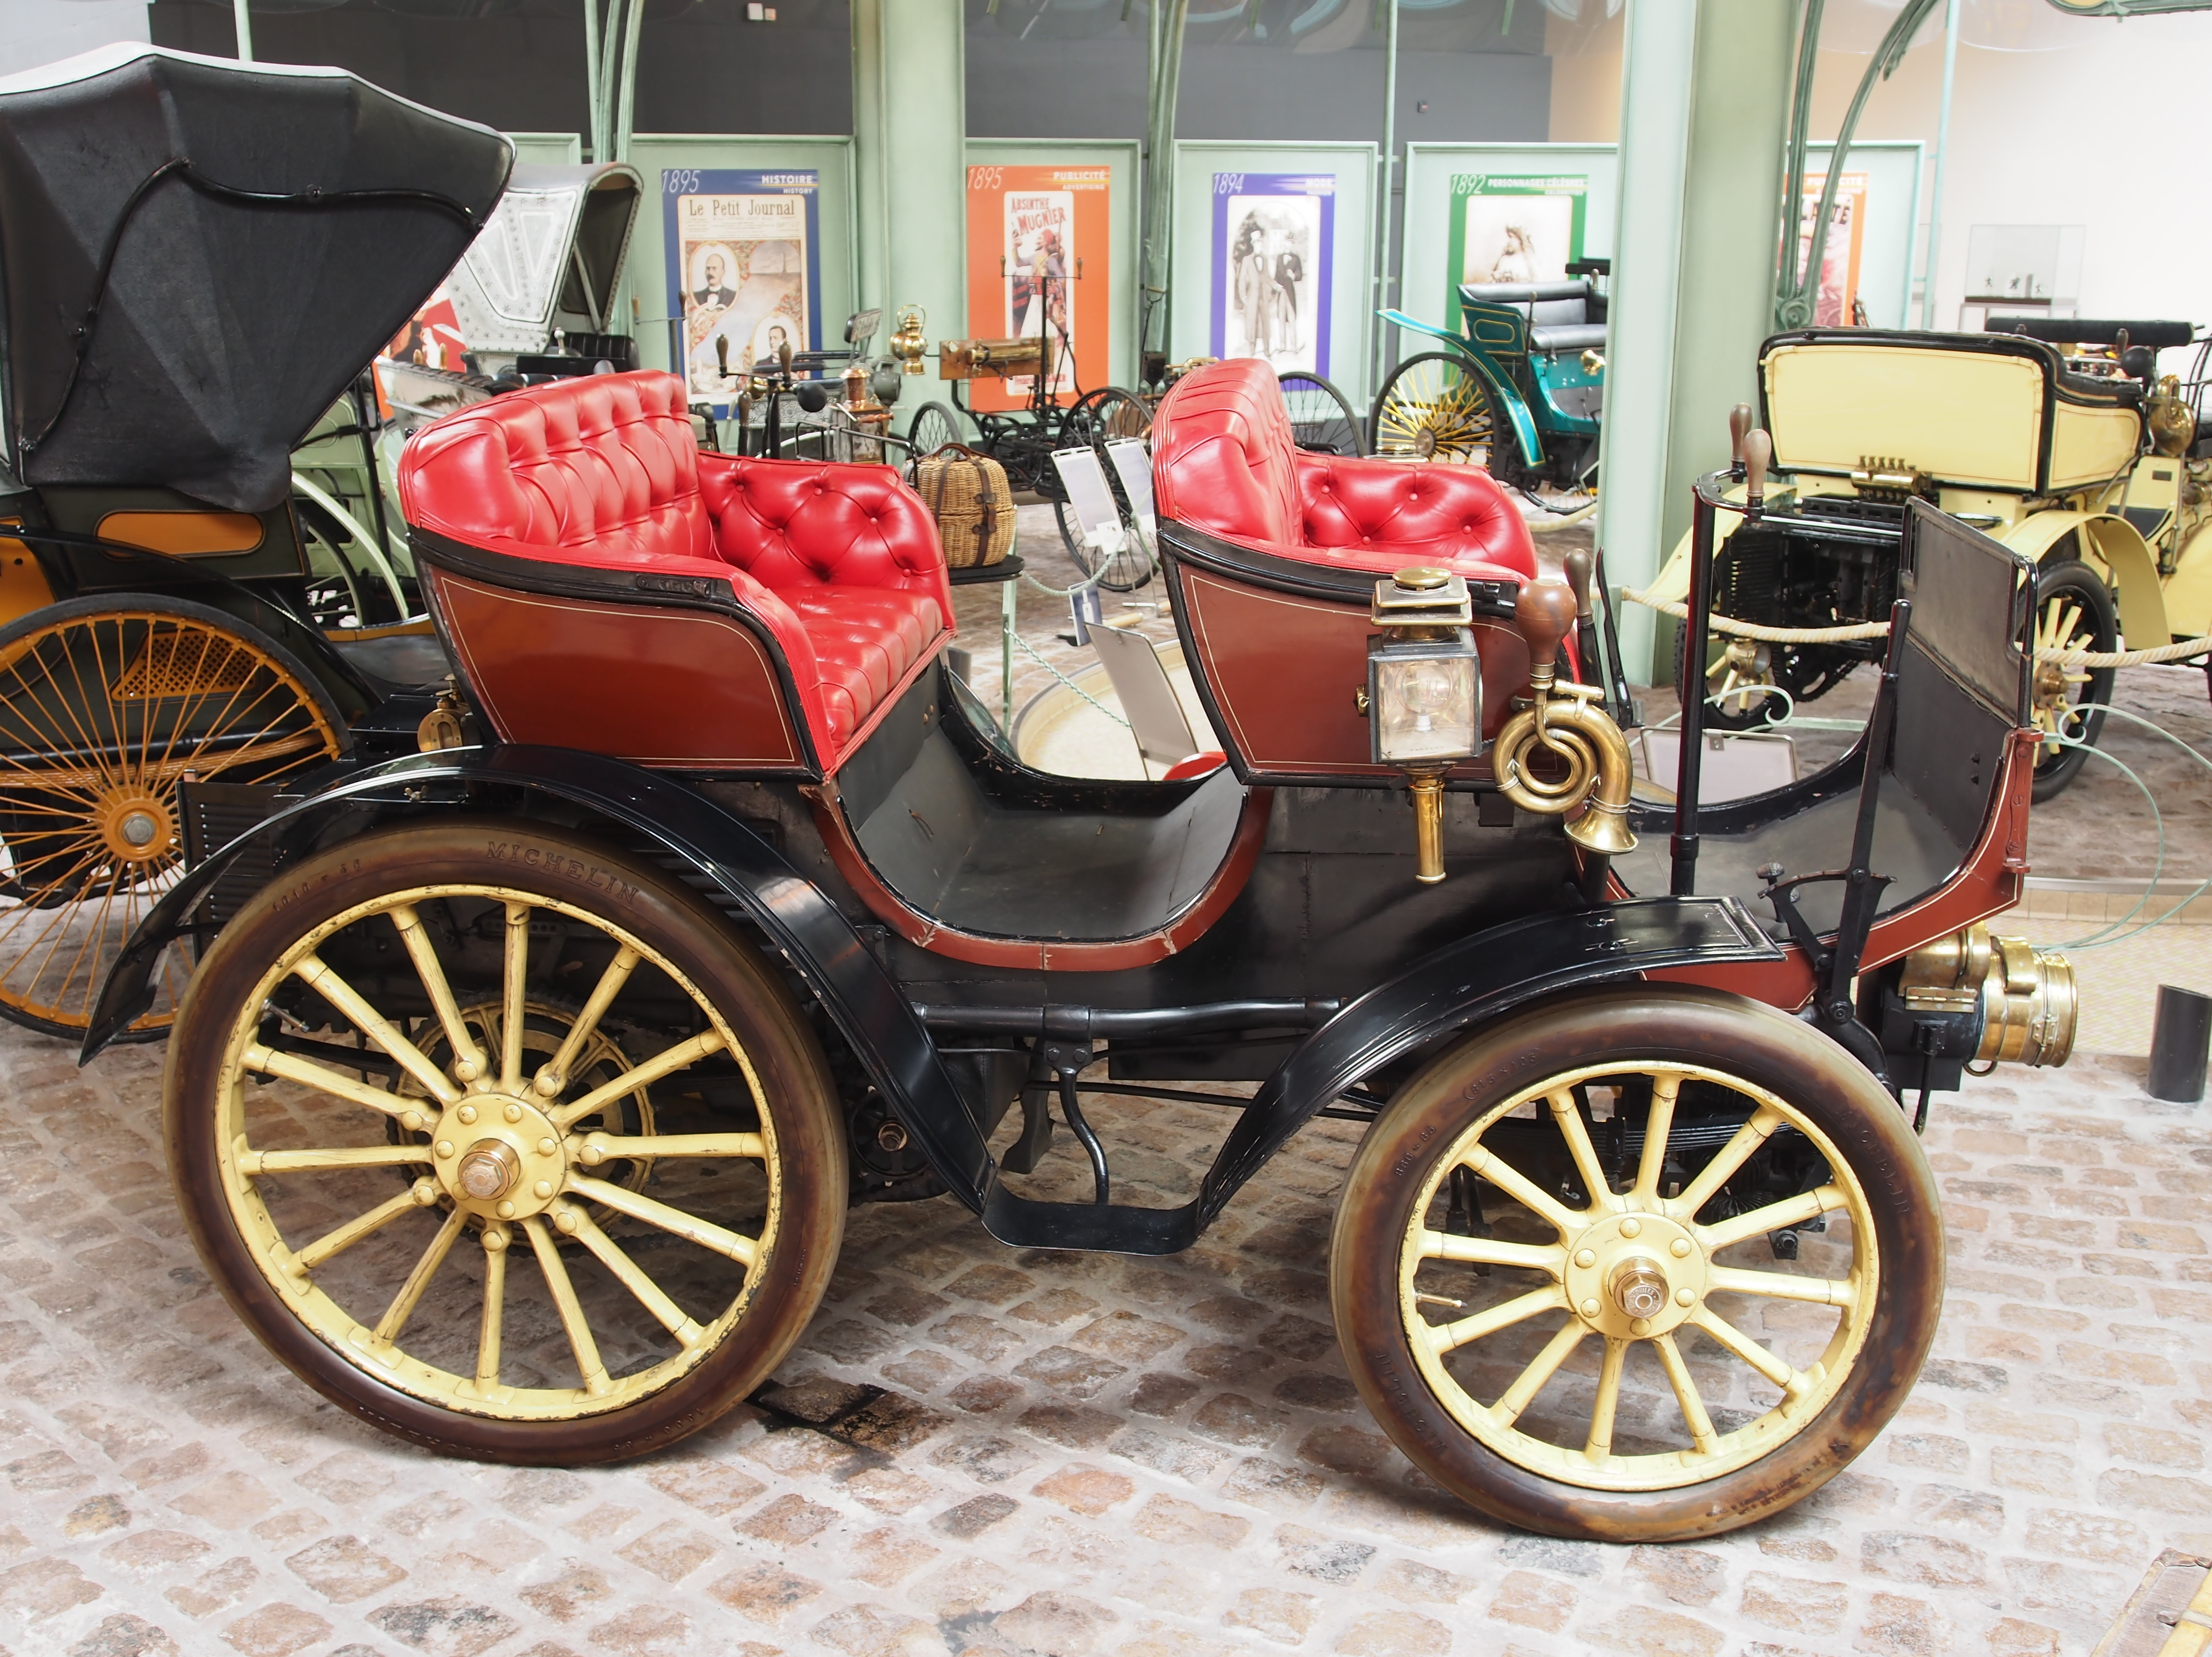 1897_Peugeot_Type_15_Pheaton_photo_3